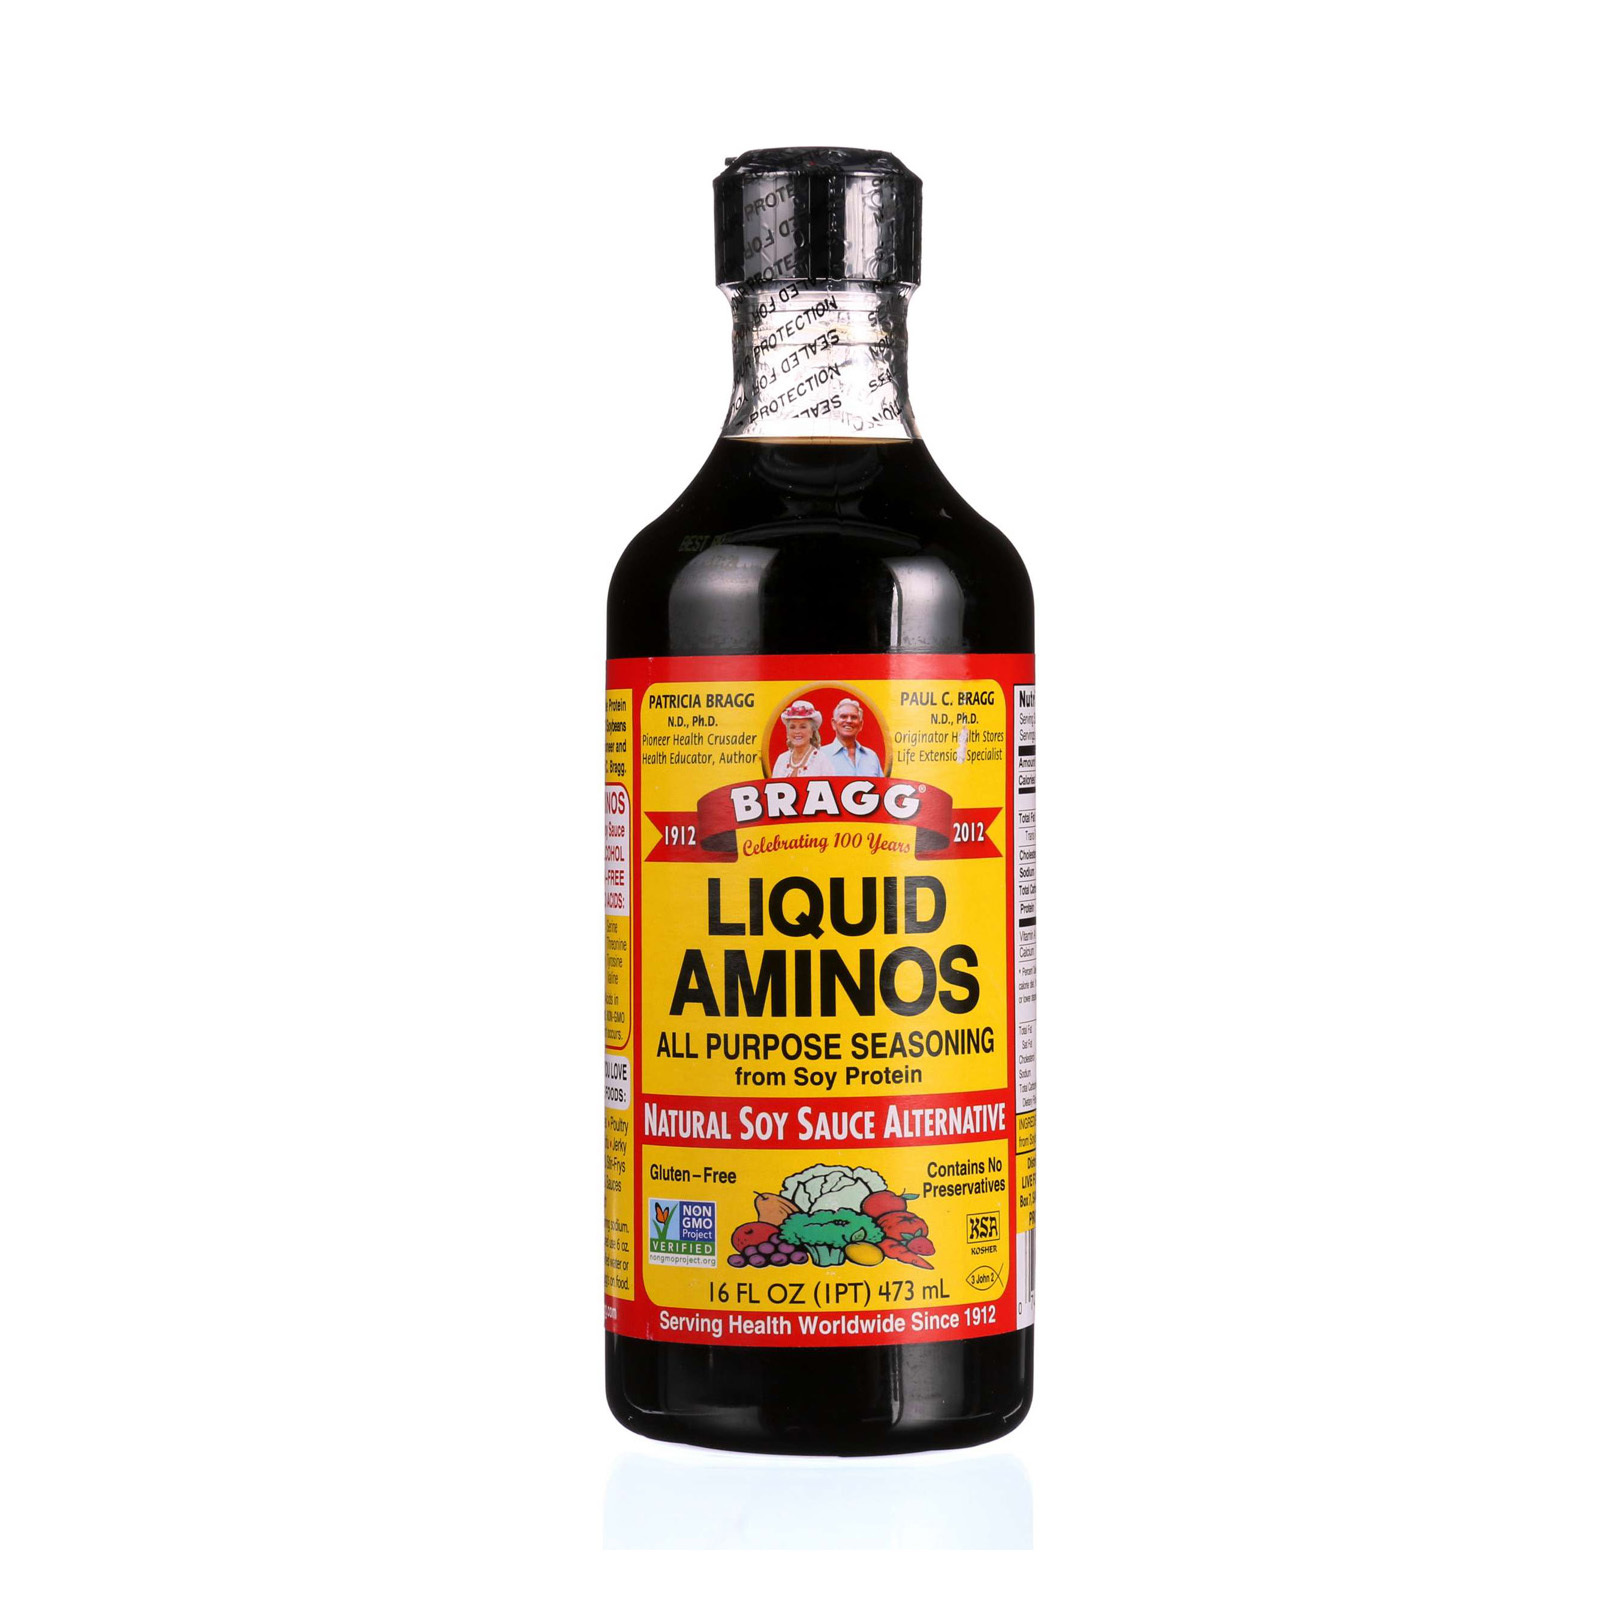 Bragg Liquid Aminos - Case of 3 - 16 fl oz